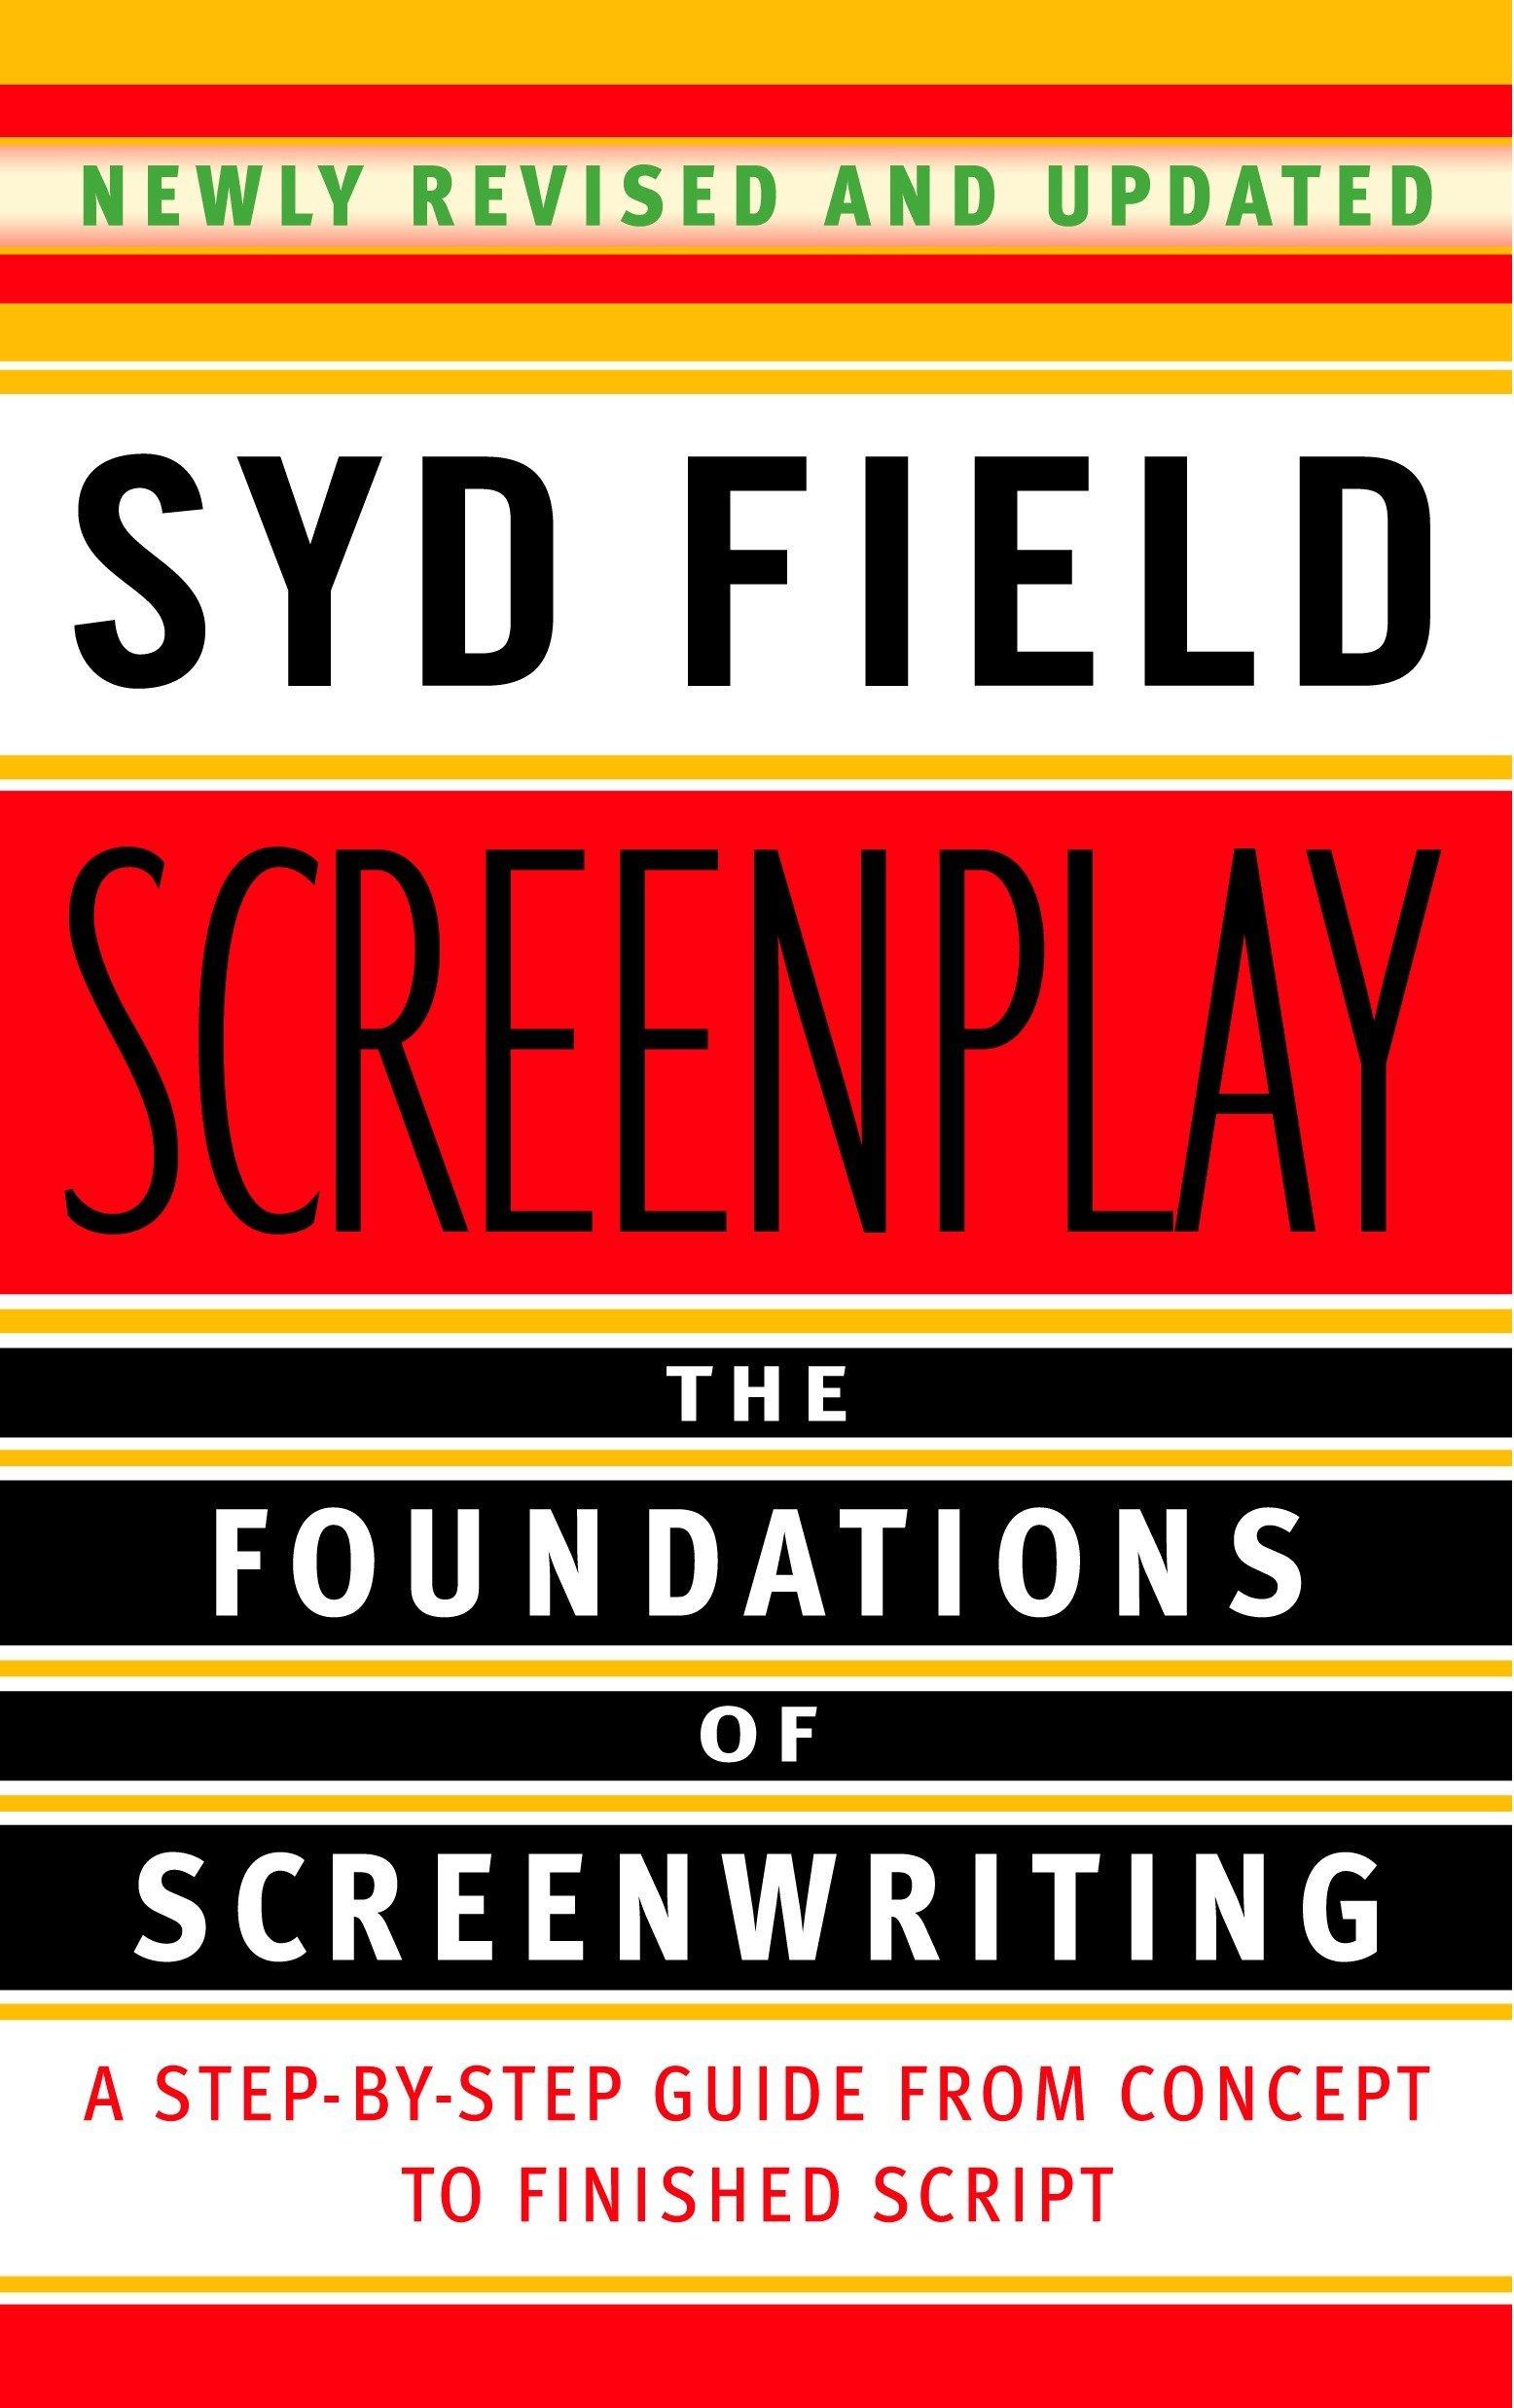 best screenwriting books reddit